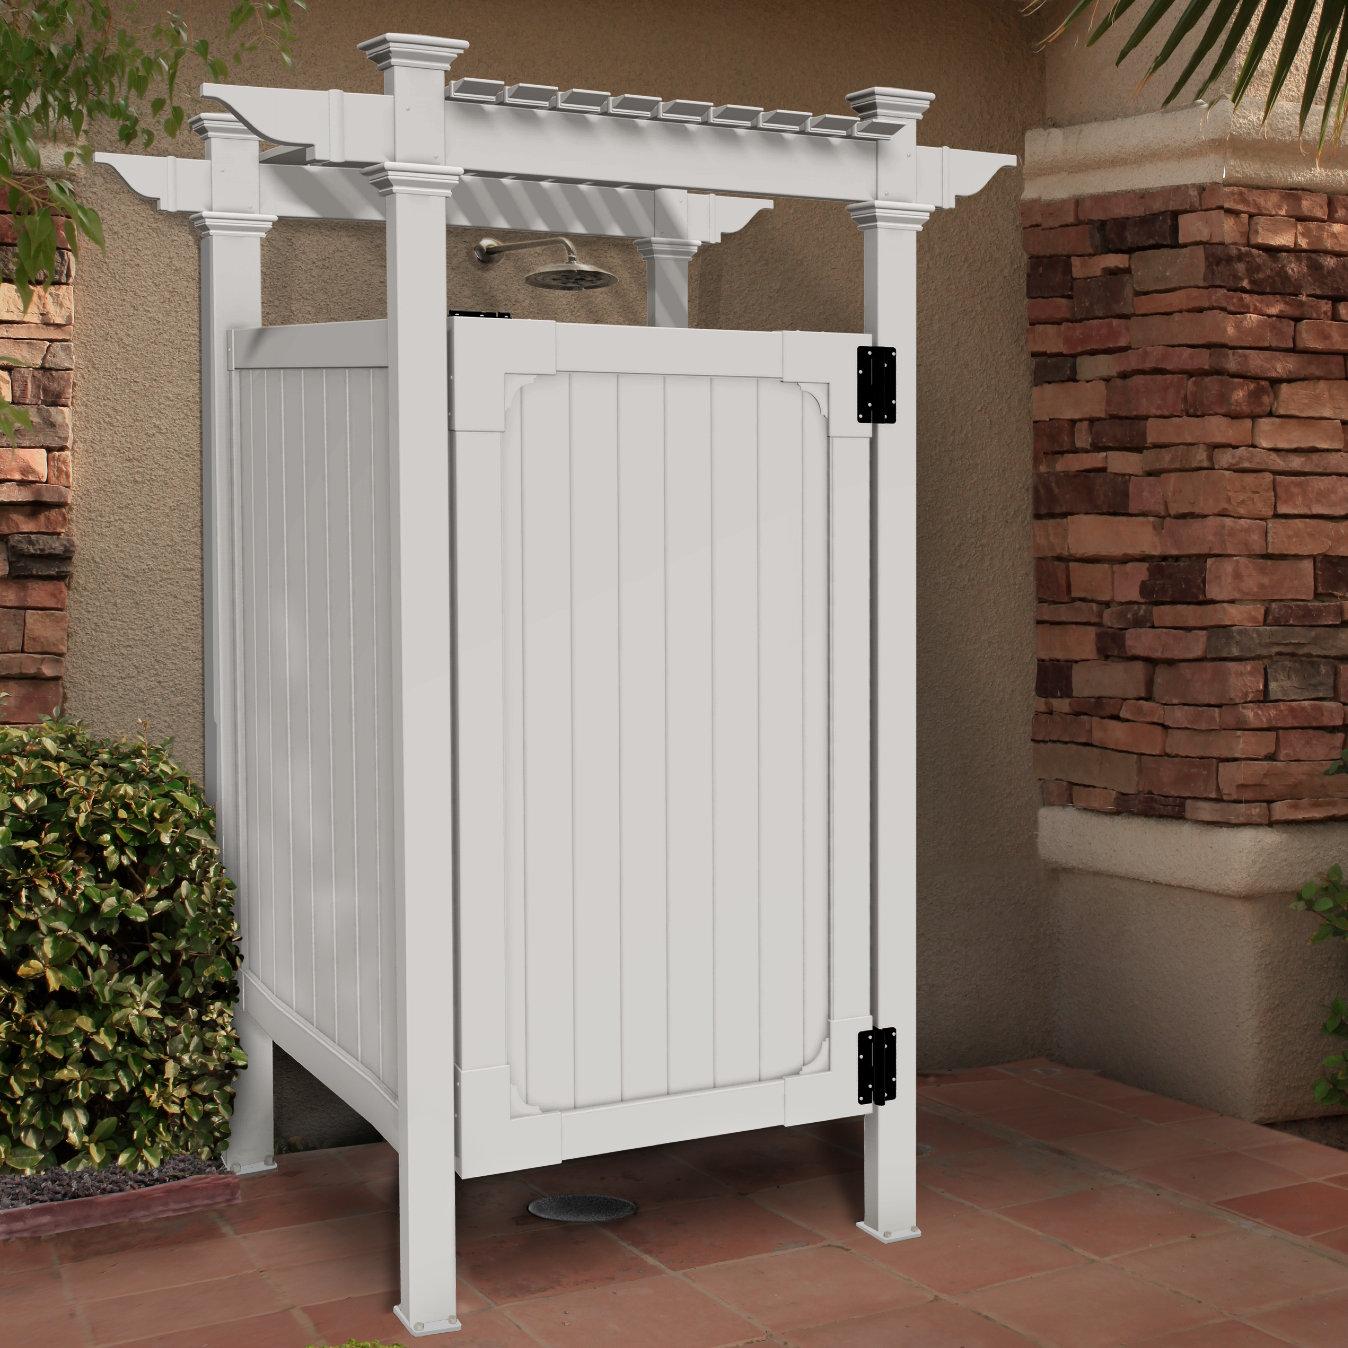 Zippity Outdoor Products Hampton Outdoor Shower Enclosure Amp Reviews Wayfair